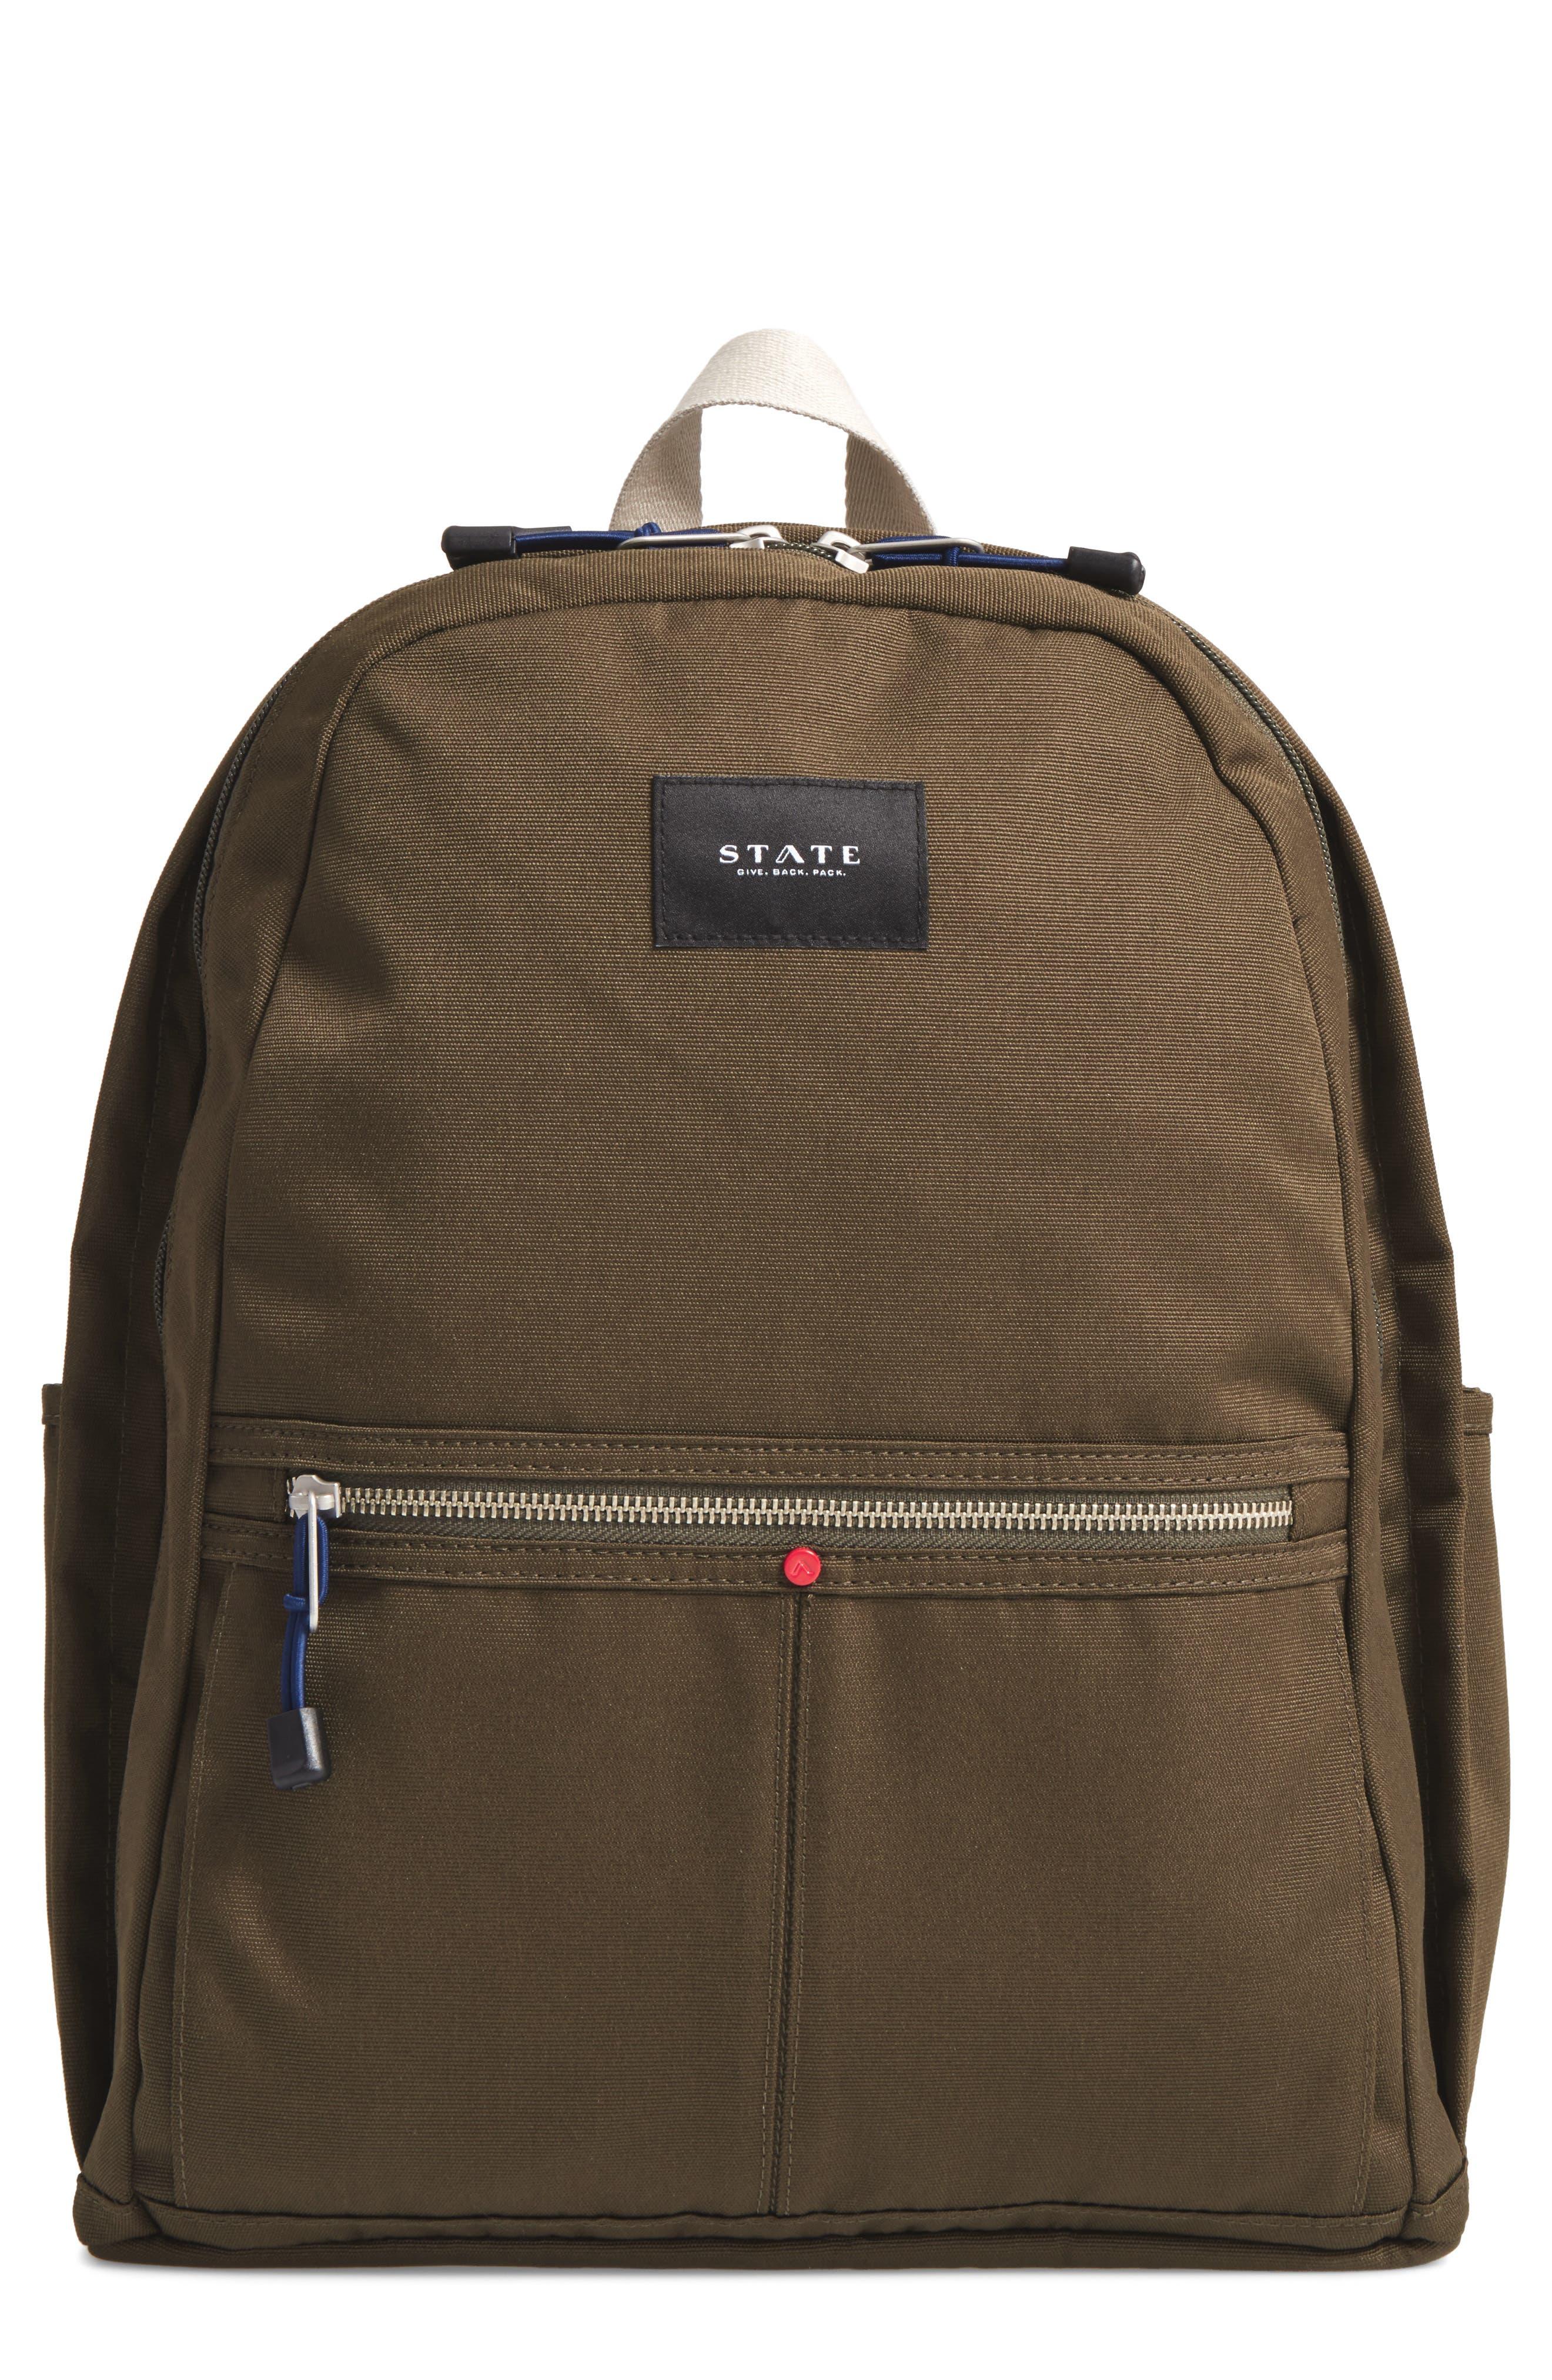 STATE Bags Williamsburg Bedford Backpack